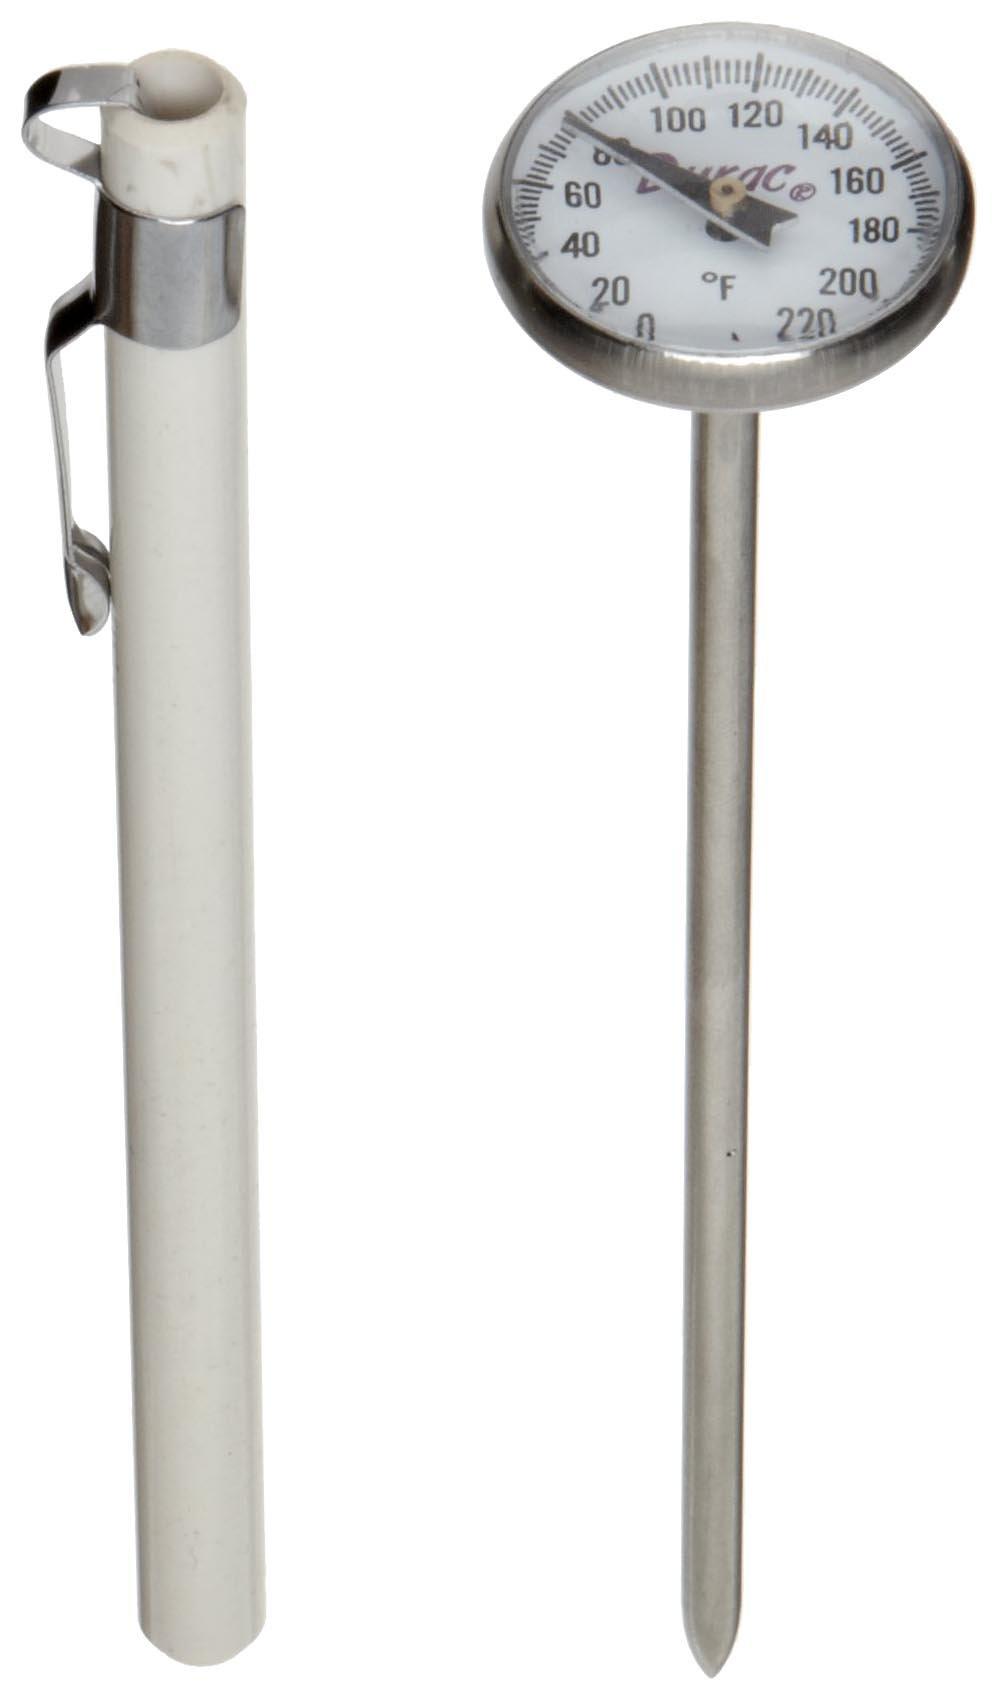 H-B DURAC Bi-Metallic Thermometer; 0 to 220F, 25mm Dial (B61310-3000)